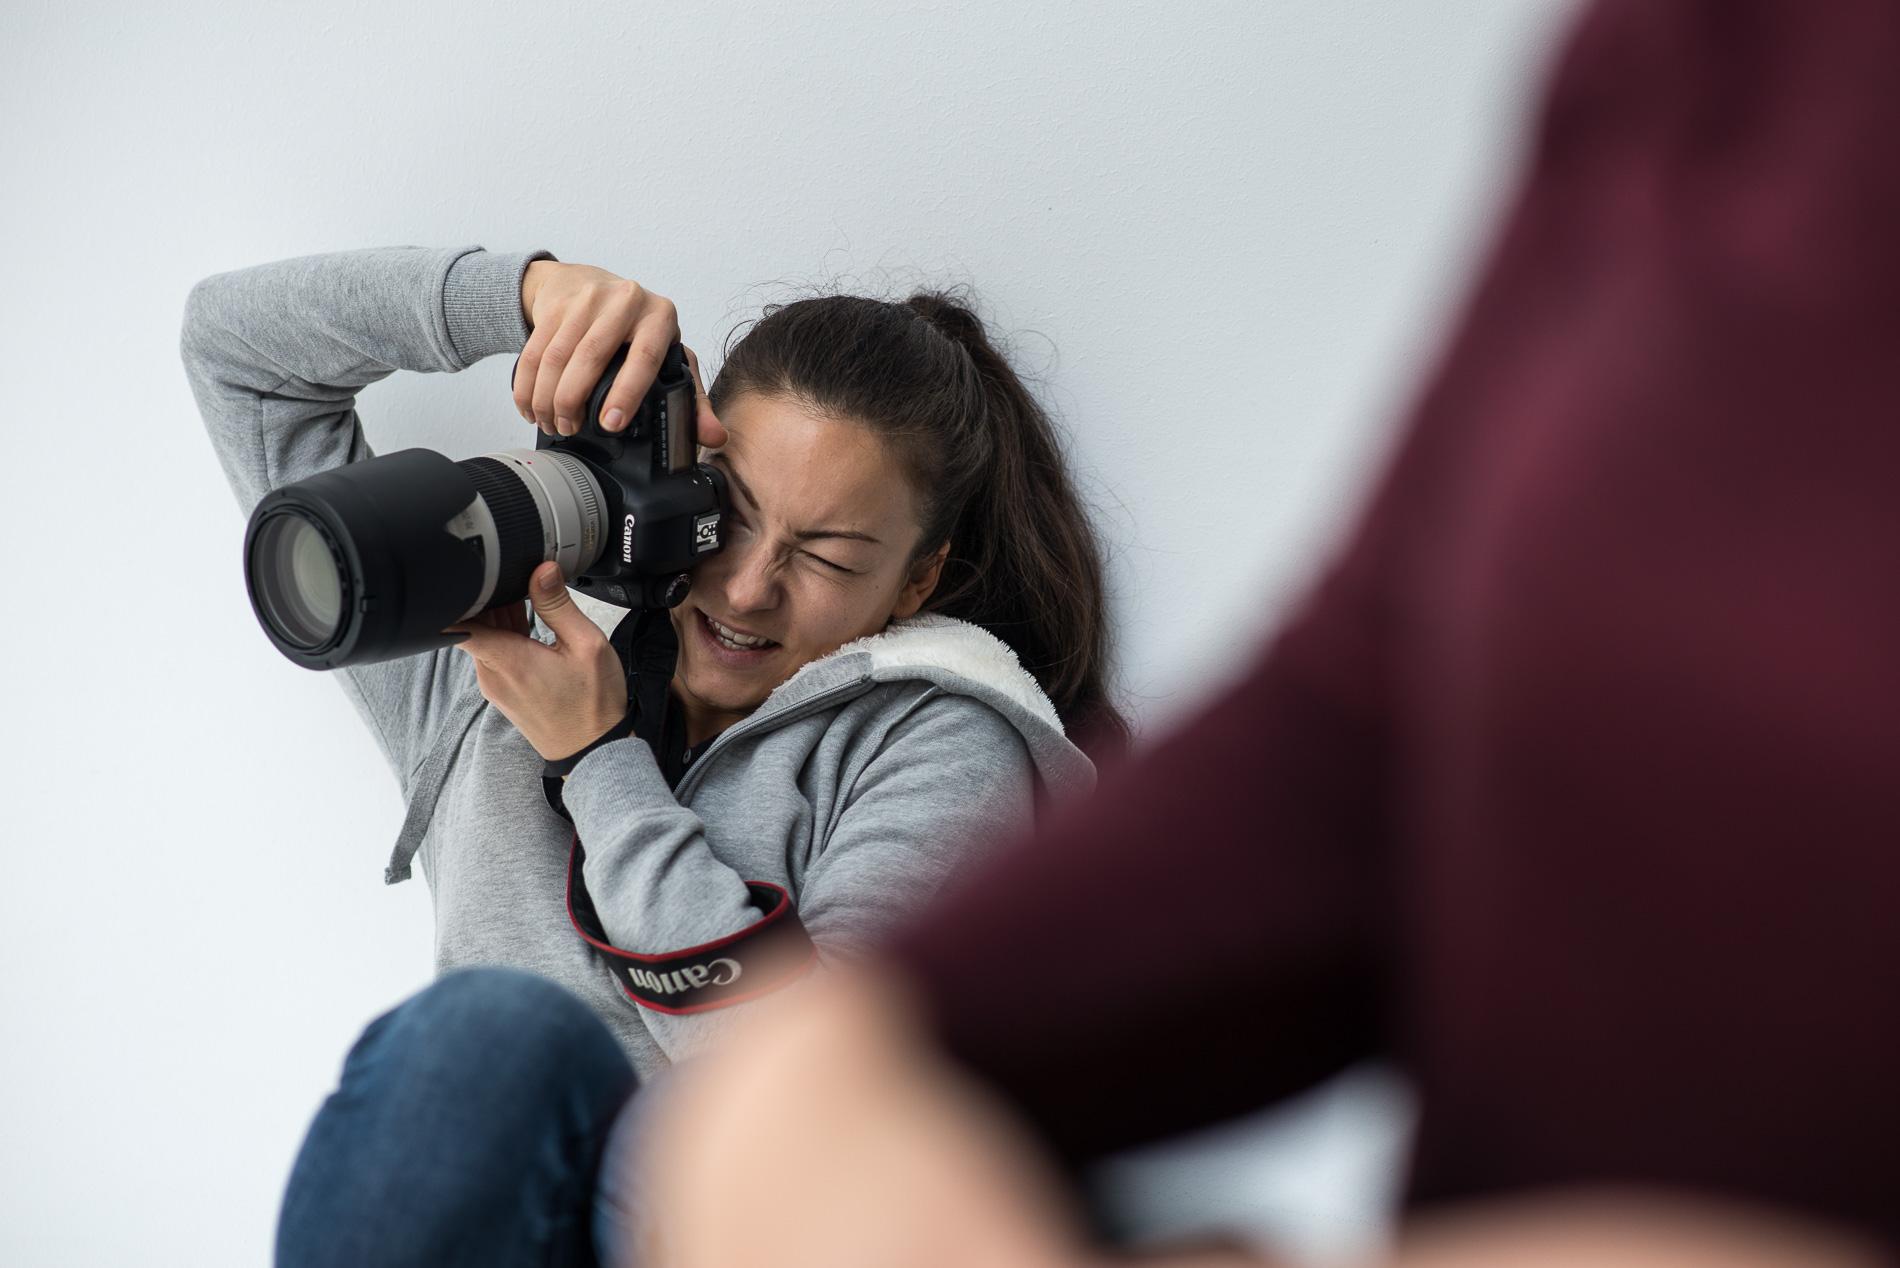 Fotografinnen Nachmittag mit Fotografin Mona Lutz im Studio Leipzig